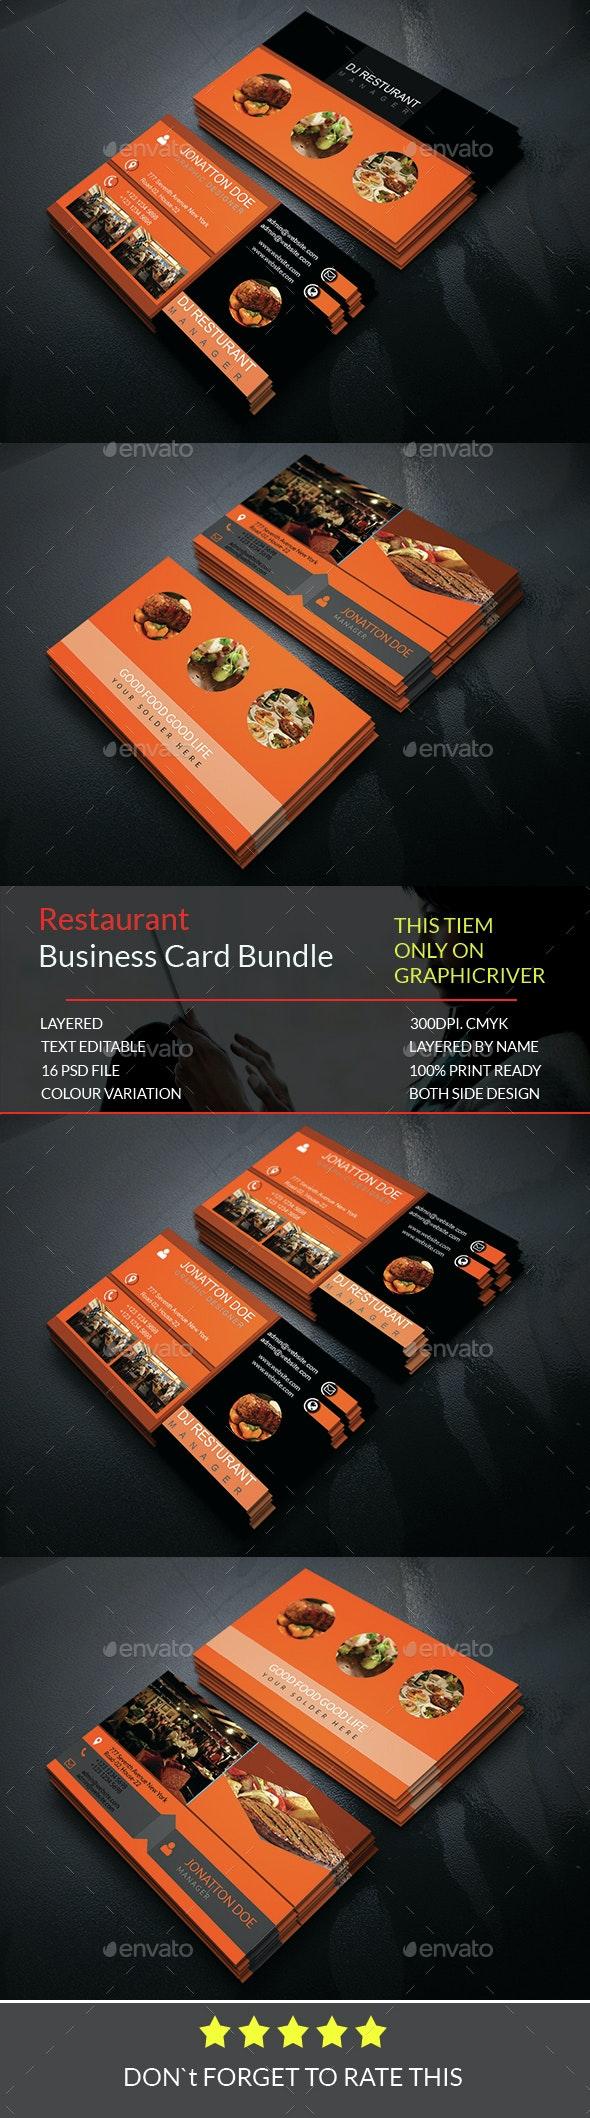 Restaurant Business Card Bundle.018 - Business Cards Print Templates